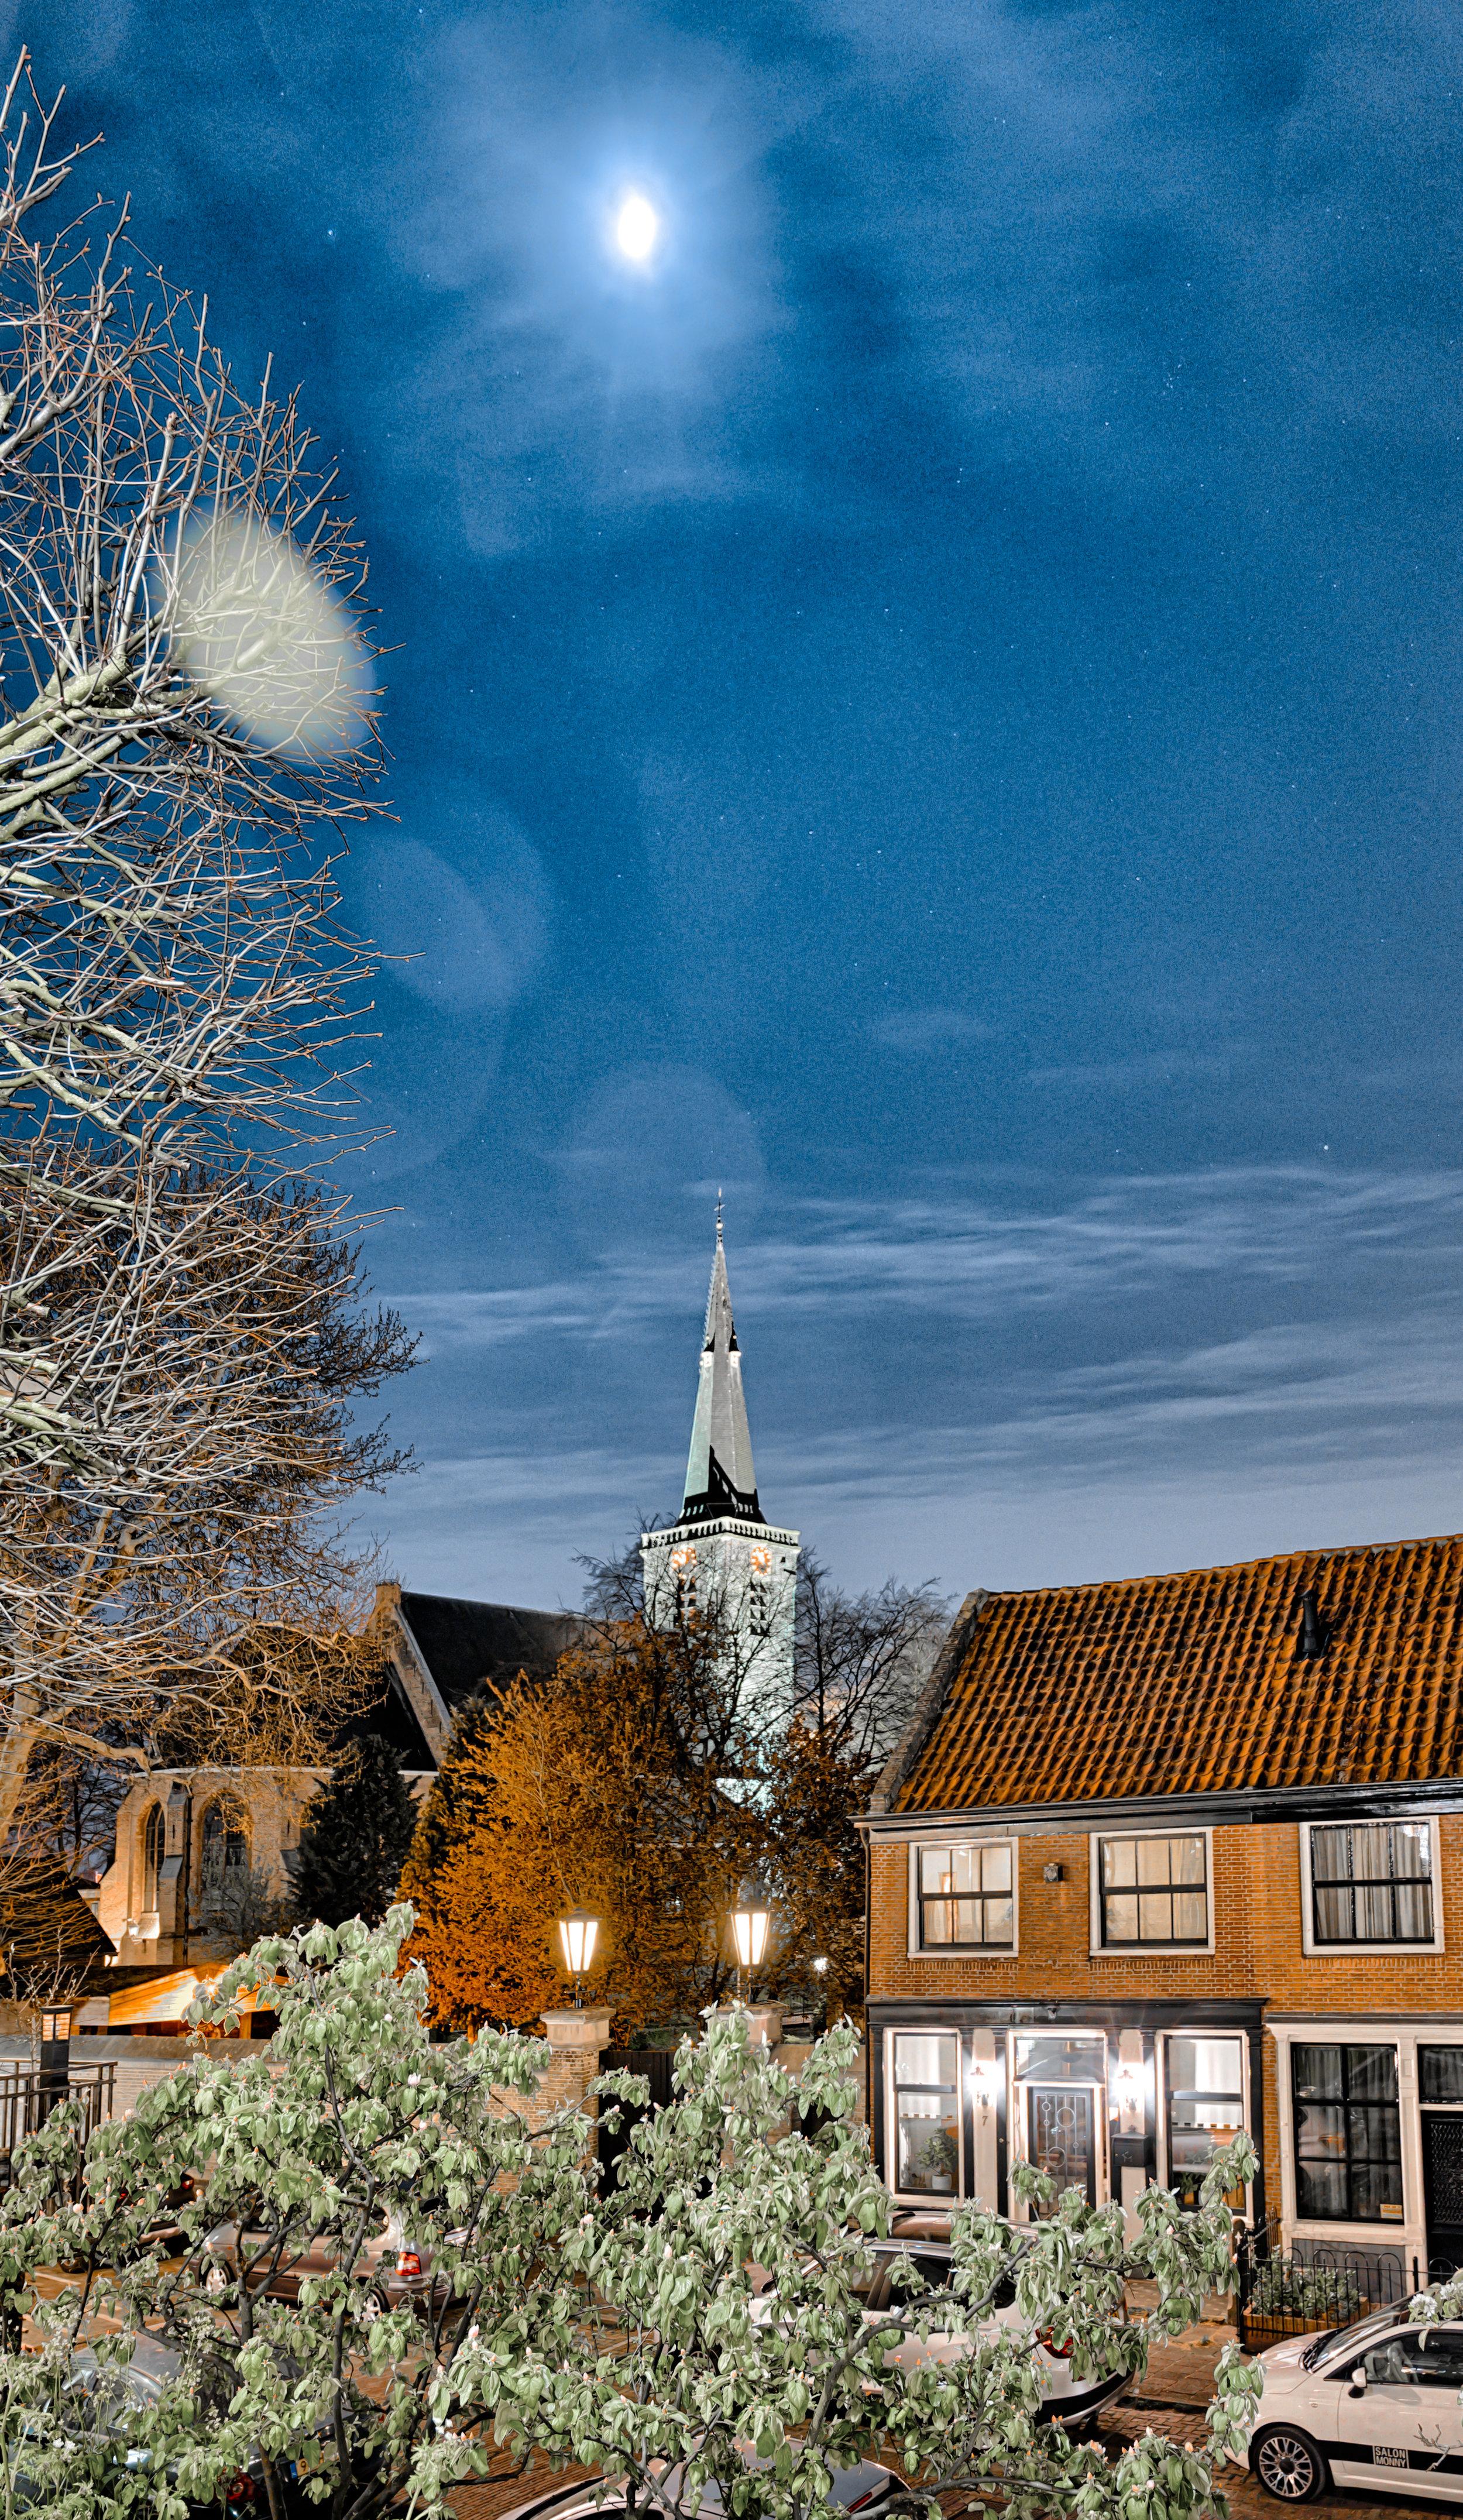 Singelkerk vanaf de Ringdijk, Ridderkerk Centrum  f/4, 1.60 seconden, ISO 800